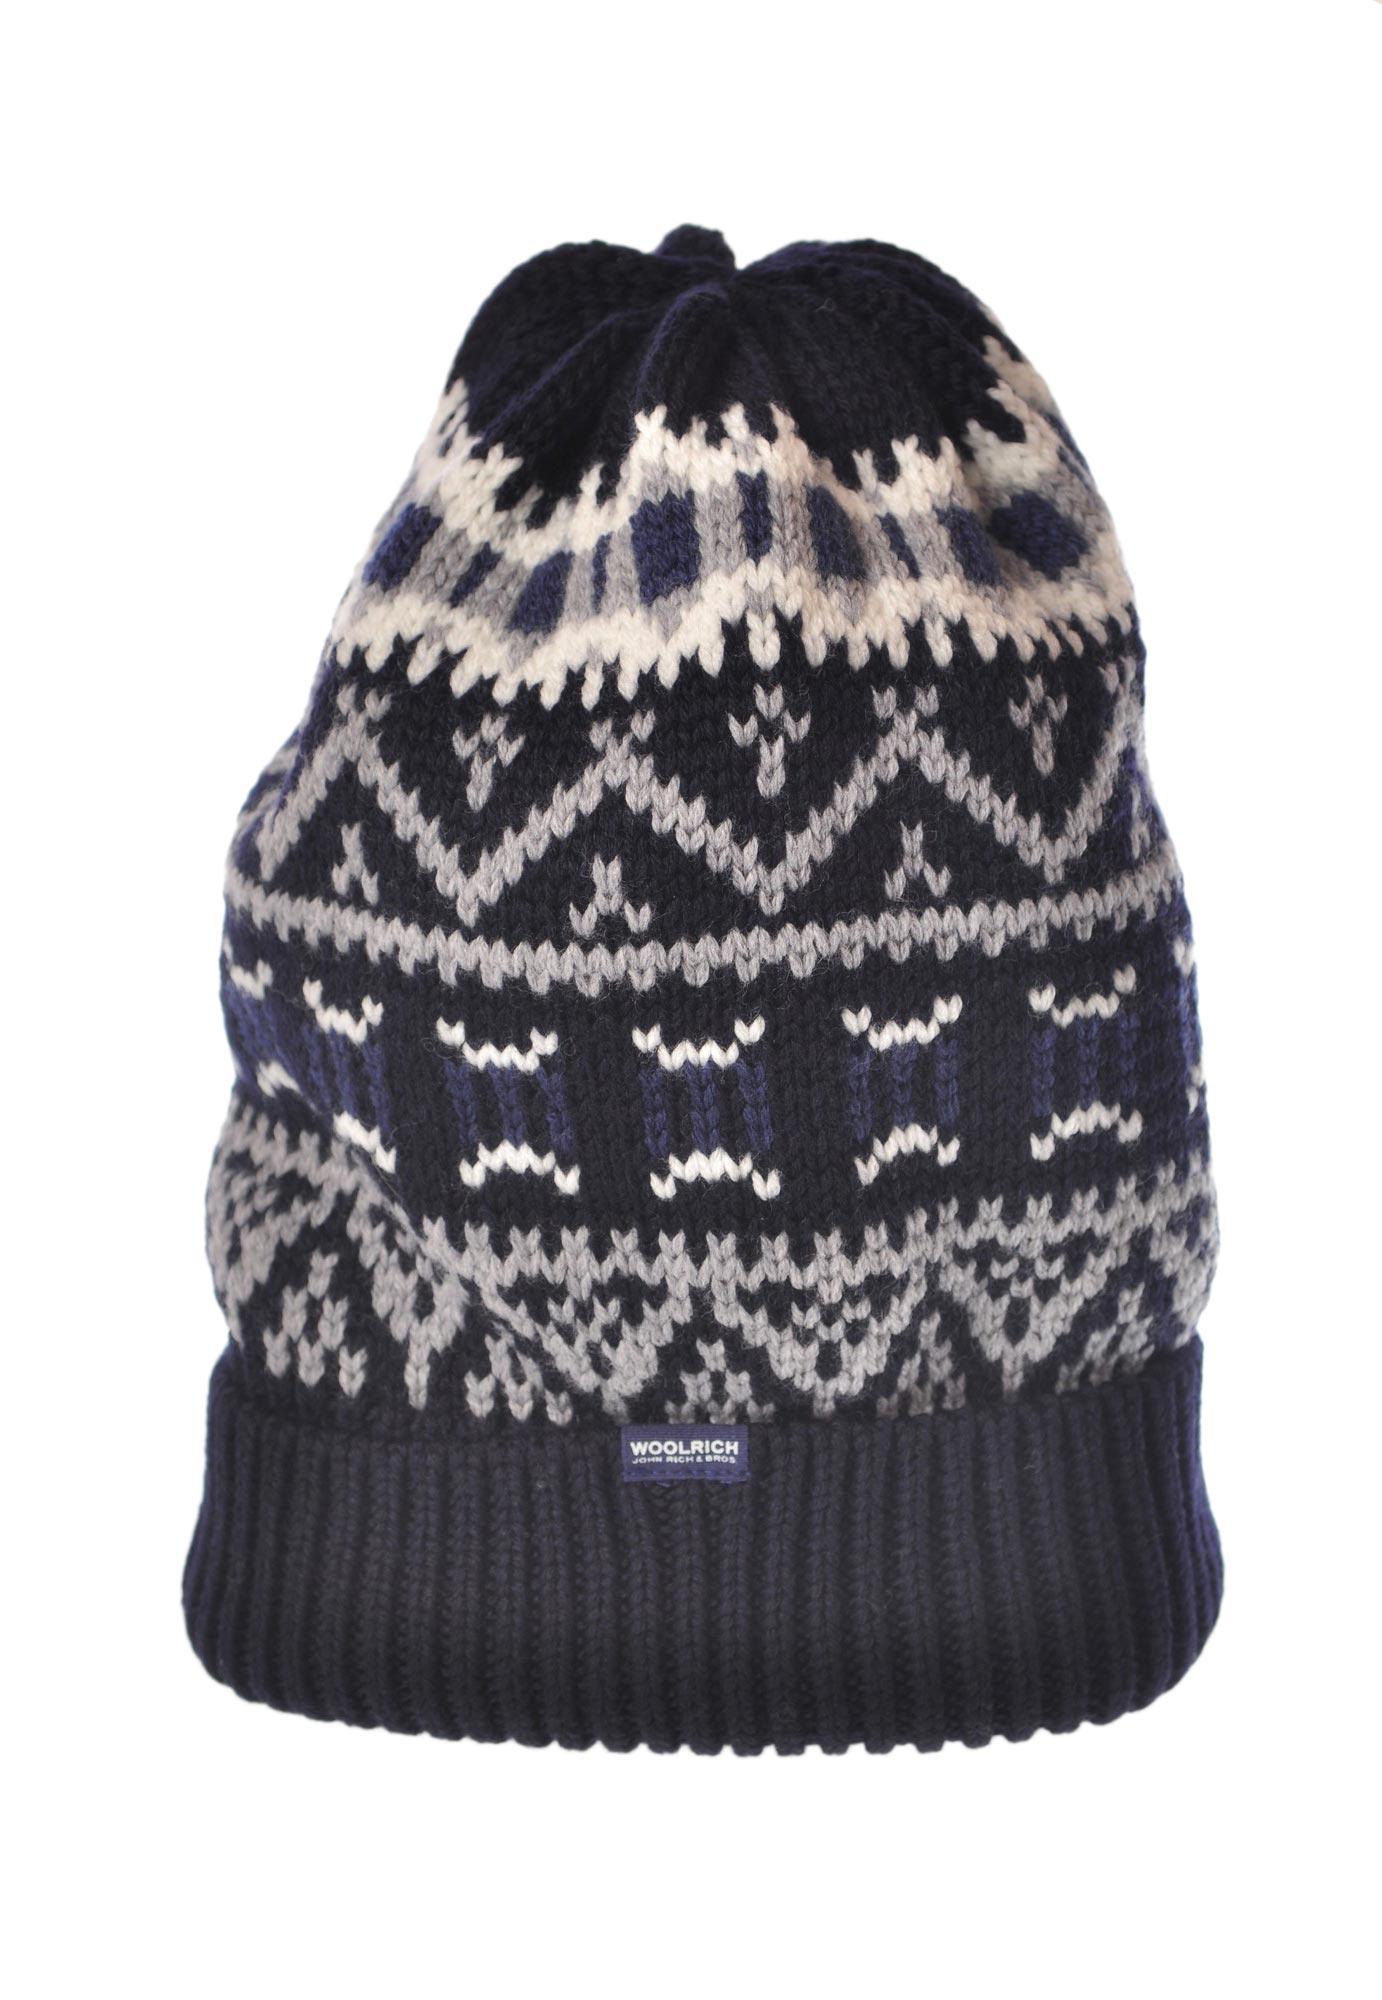 Woolrich Hats Beanie  f52ec74d70b